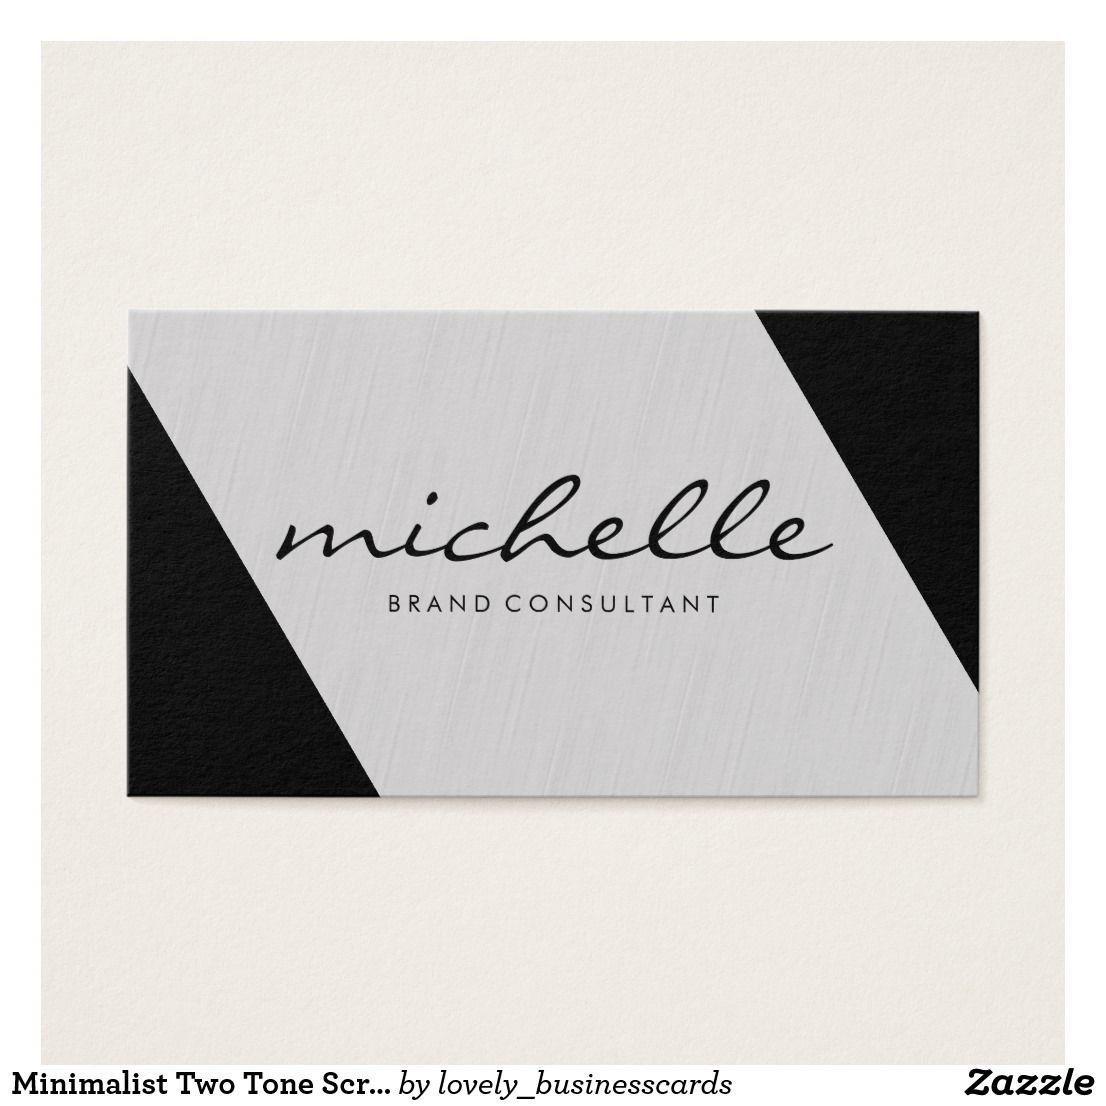 Minimalist Two Tone Script Font Business Card | Zazzle com